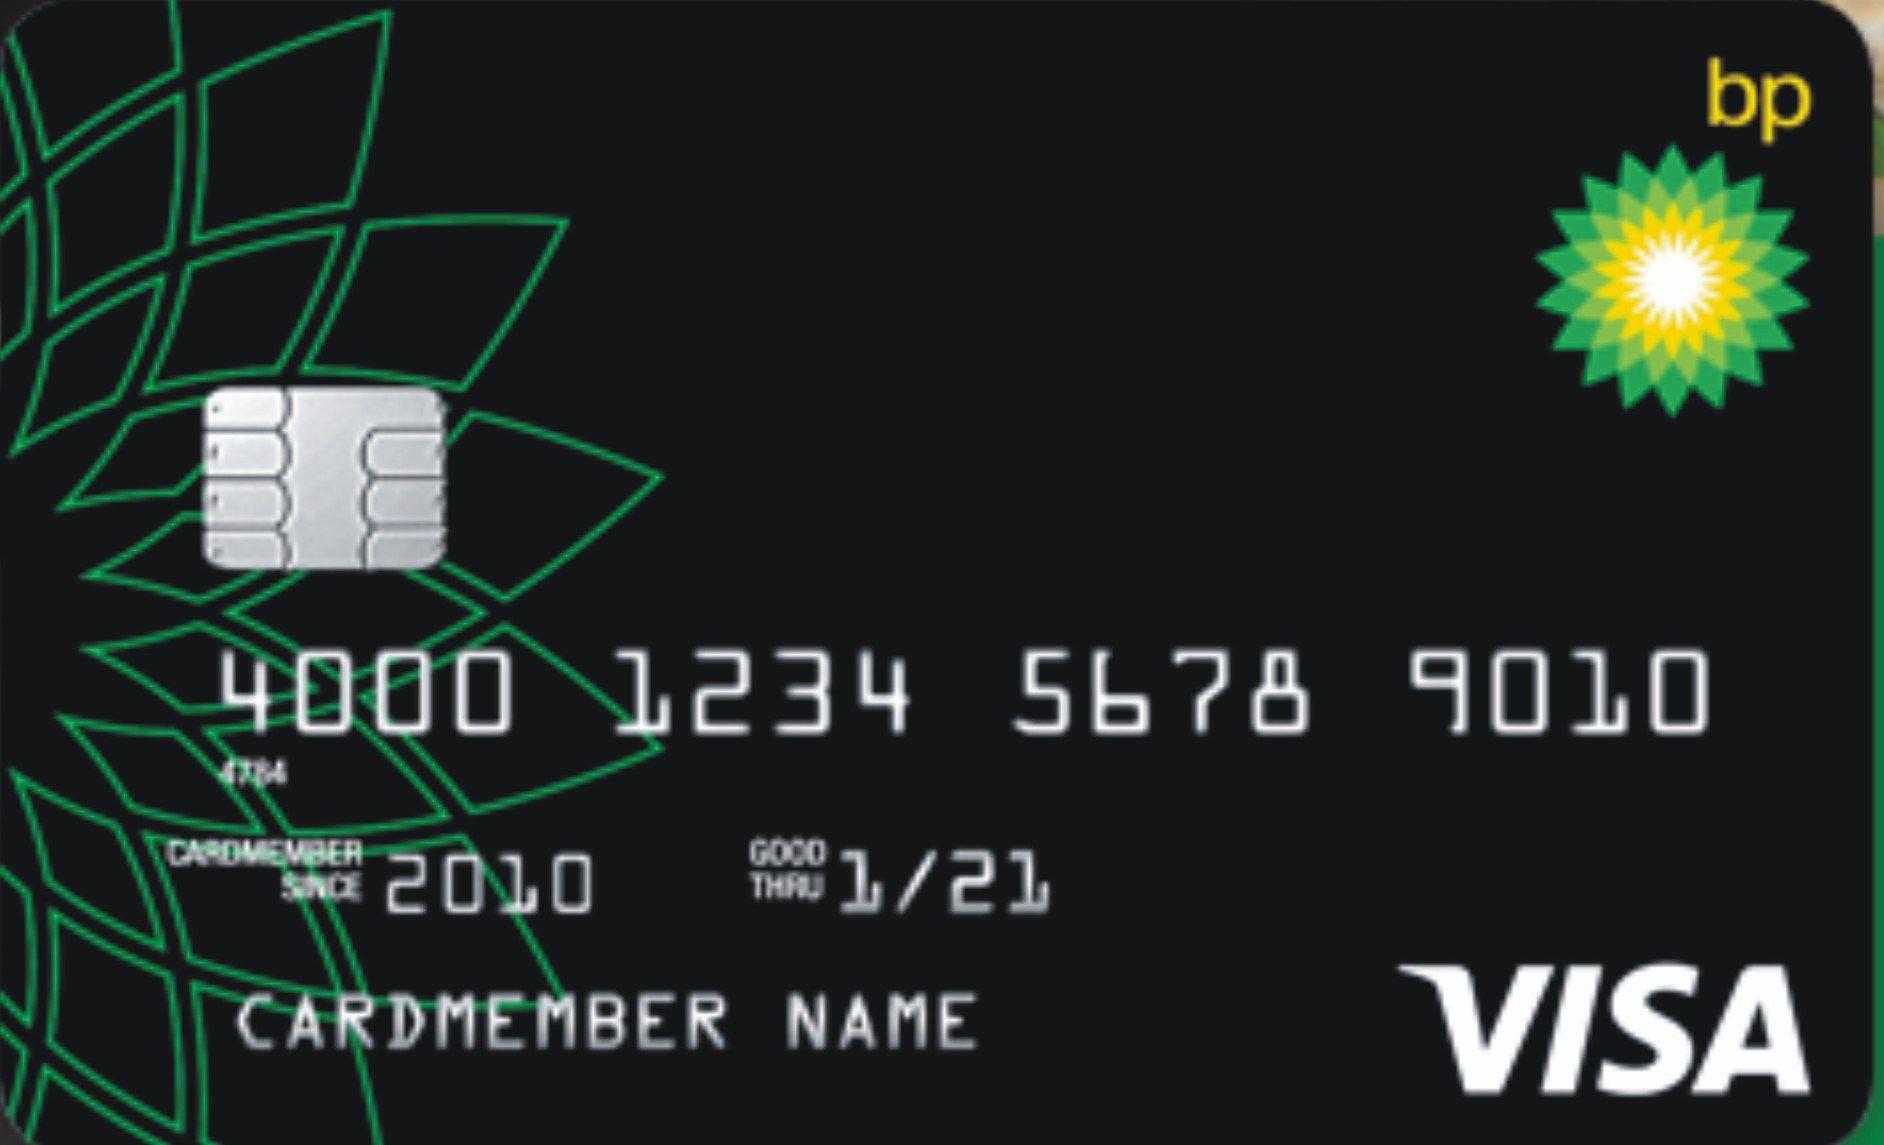 Bpsecuredcreditcardreviewbpphonenumber secure